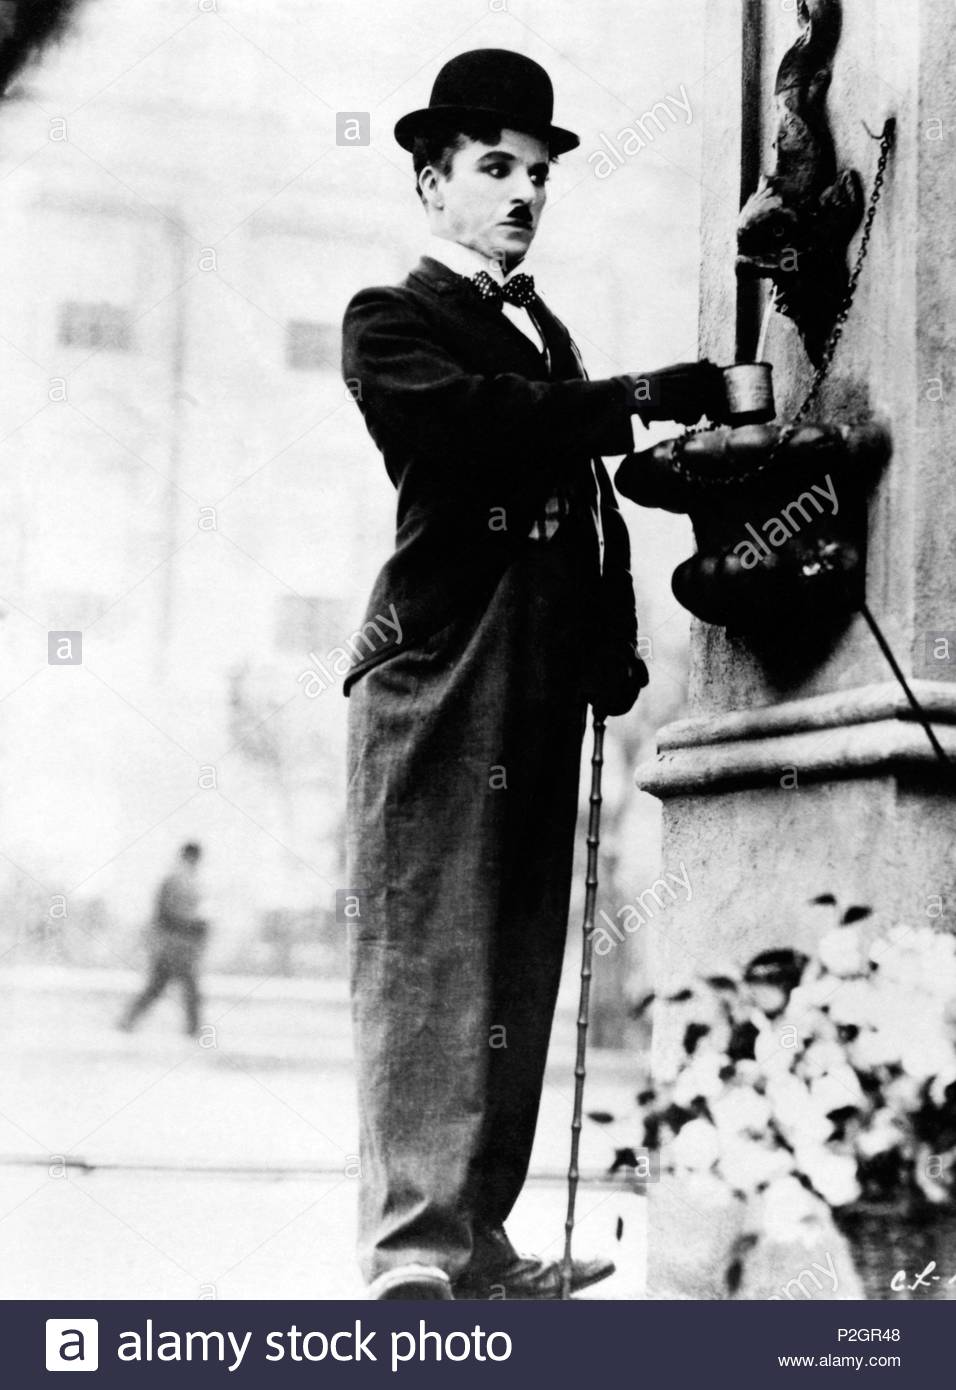 Original Film Title: CITY LIGHTS.  English Title: CITY LIGHTS.  Film Director: CHARLIE CHAPLIN.  Year: 1931.  Stars: CHARLIE CHAPLIN. Credit: UNITED ARTISTS / Album - Stock Image